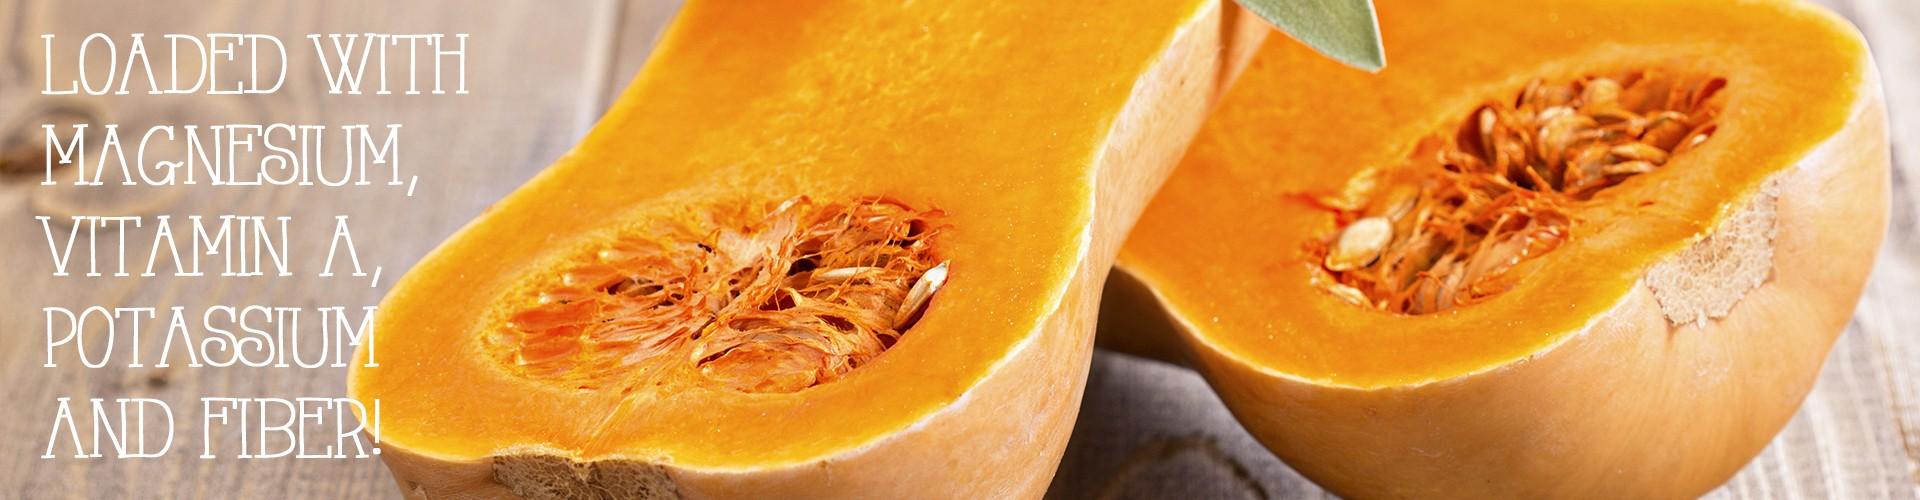 butternut squash benefits